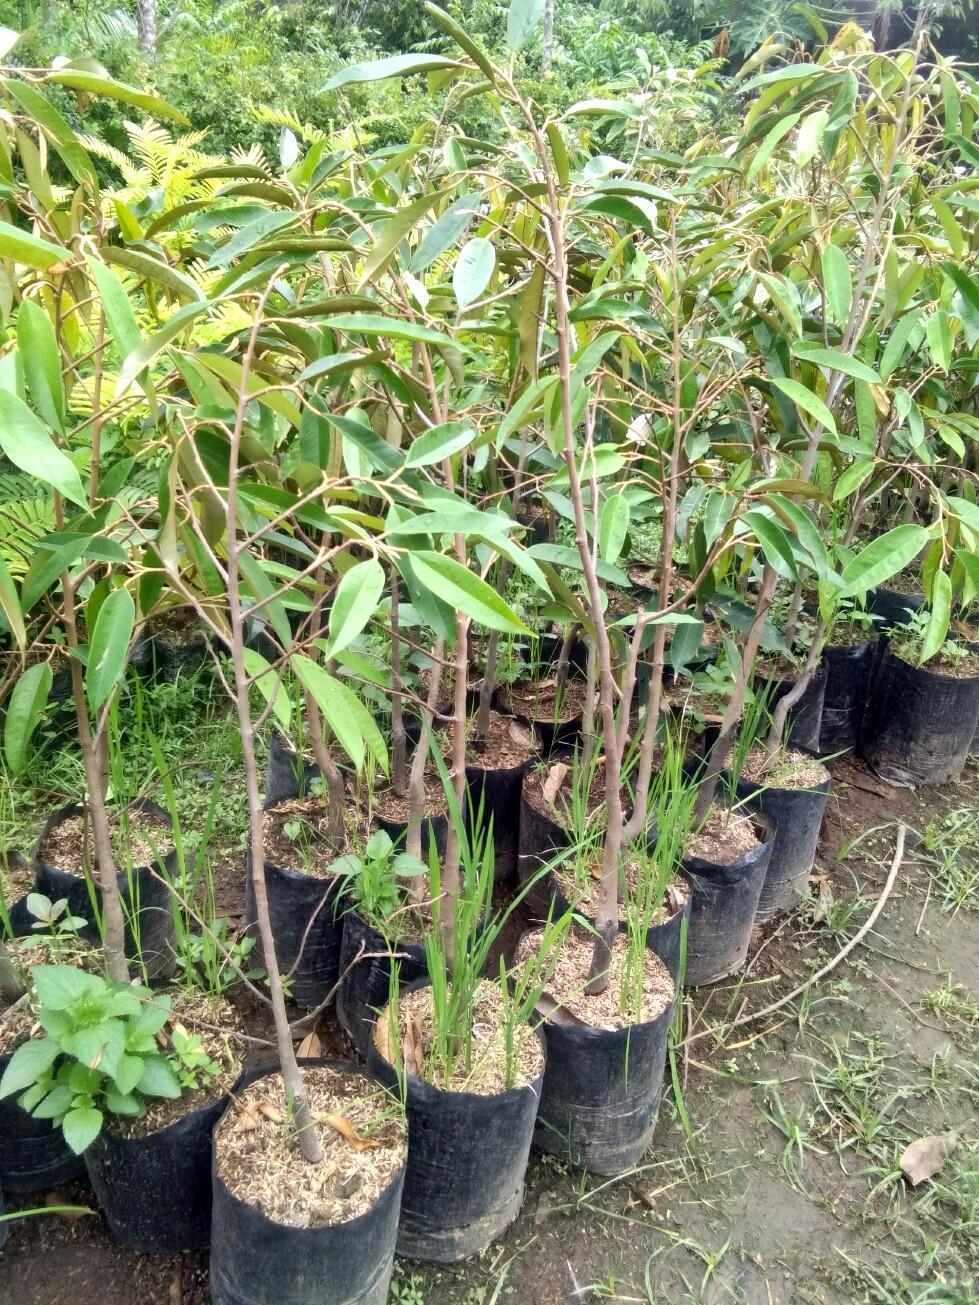 Jual bibit tanaman buah durian kani